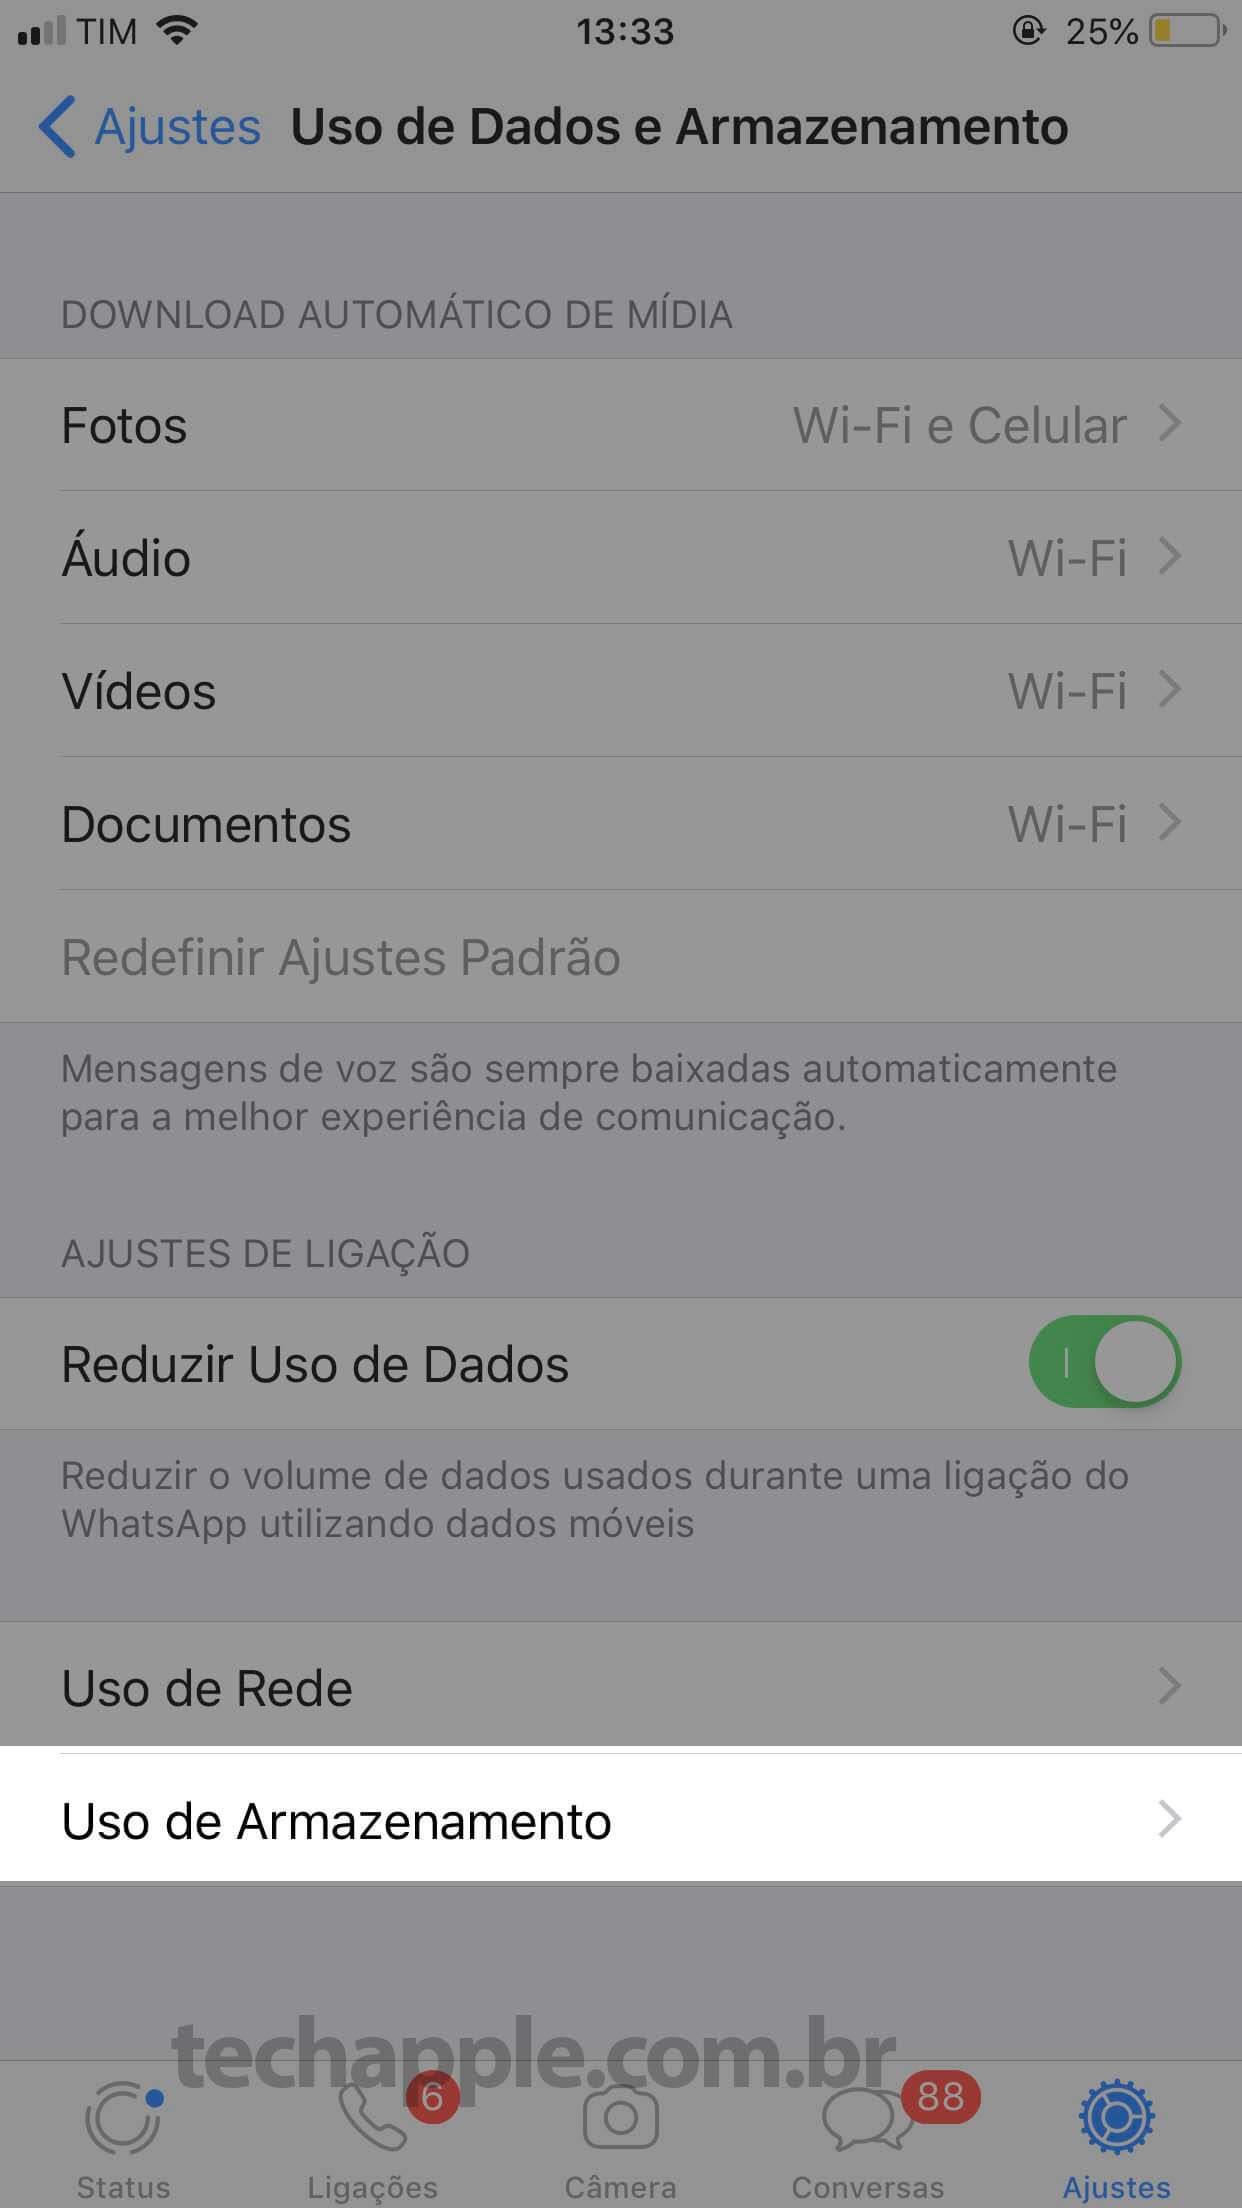 WhatsApp Ajustes 2 - TechApple.com.br